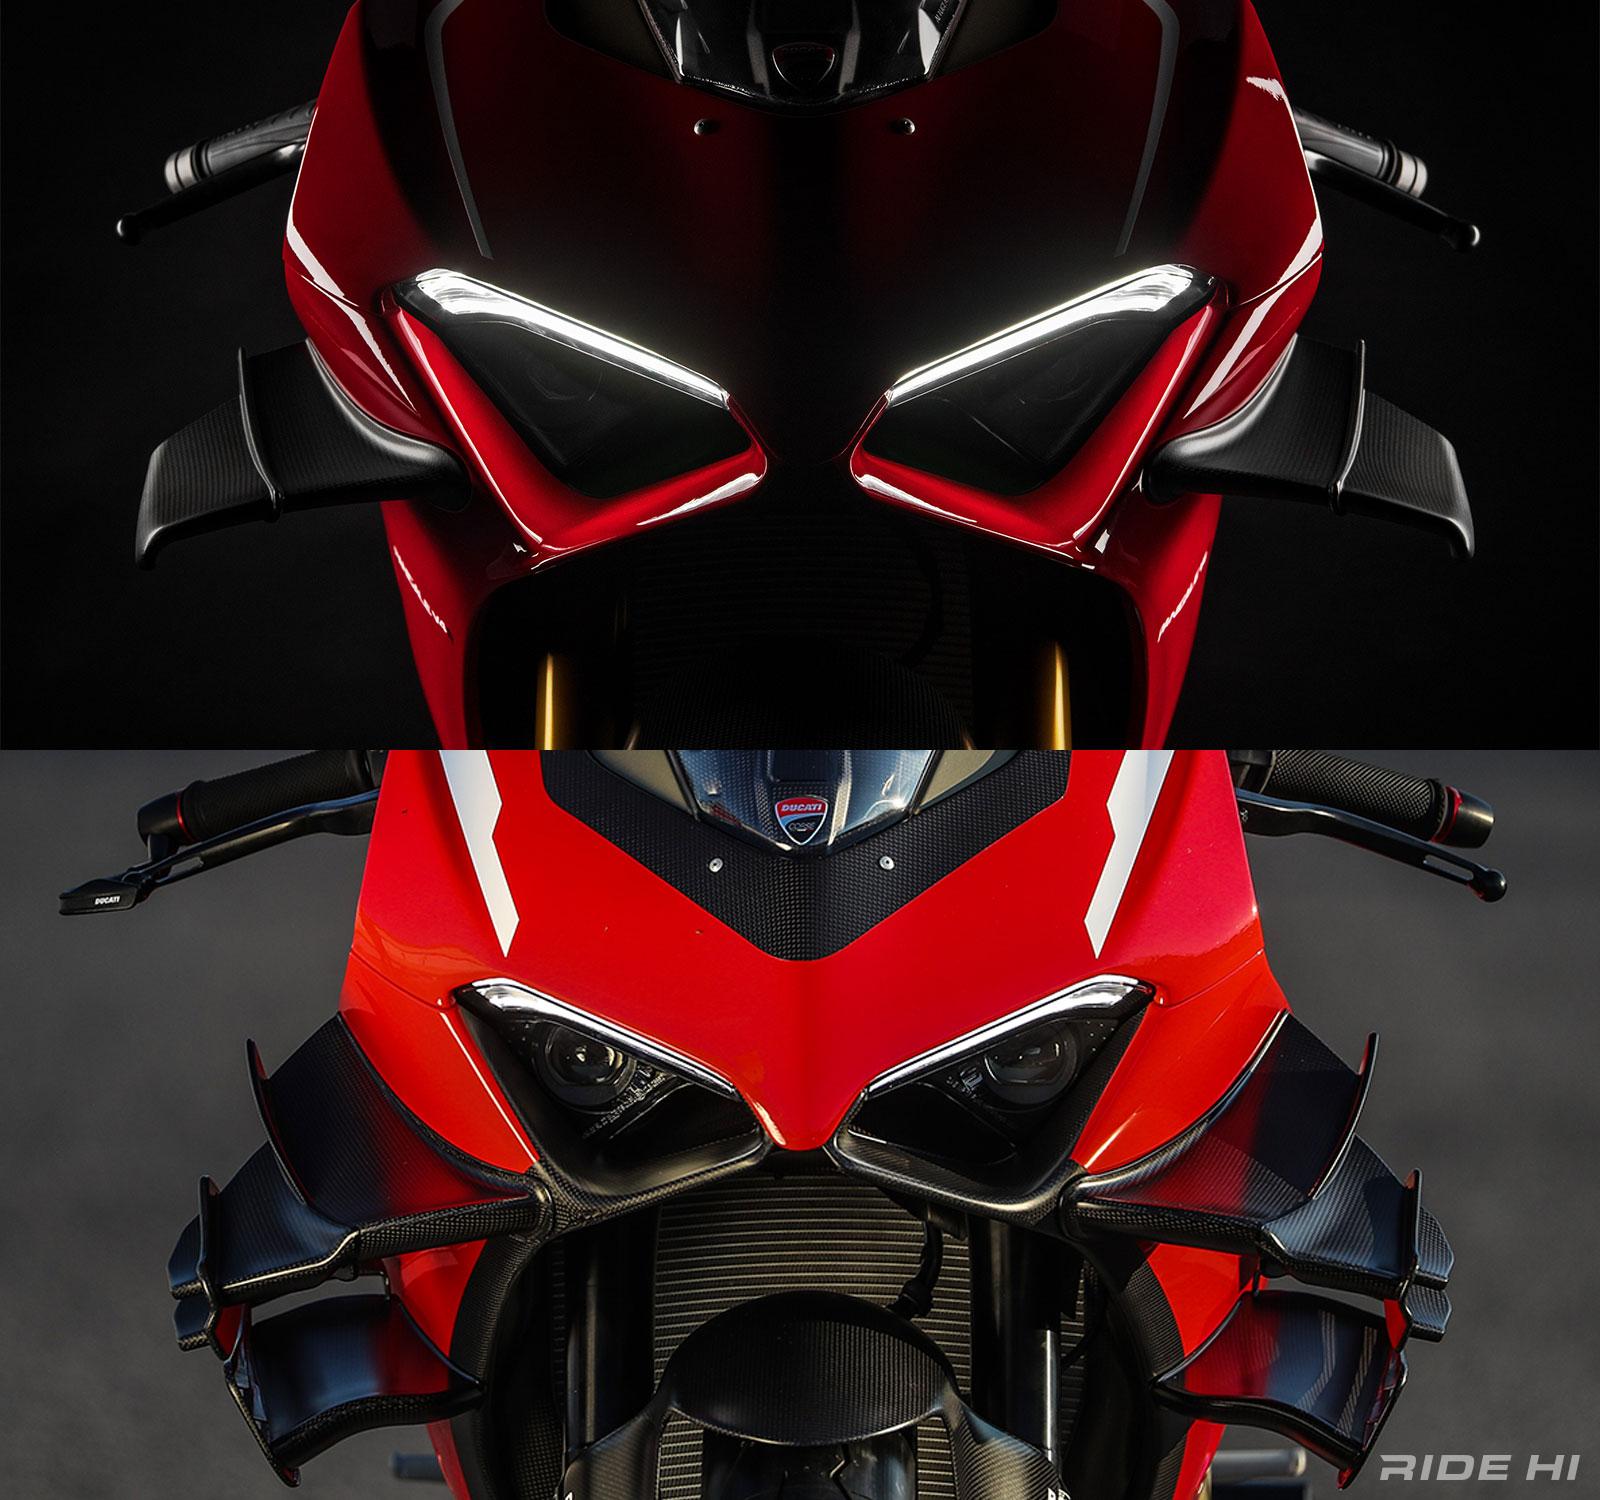 Bi mat dang sau nhung canh gio winglet tren MotoGP - 4